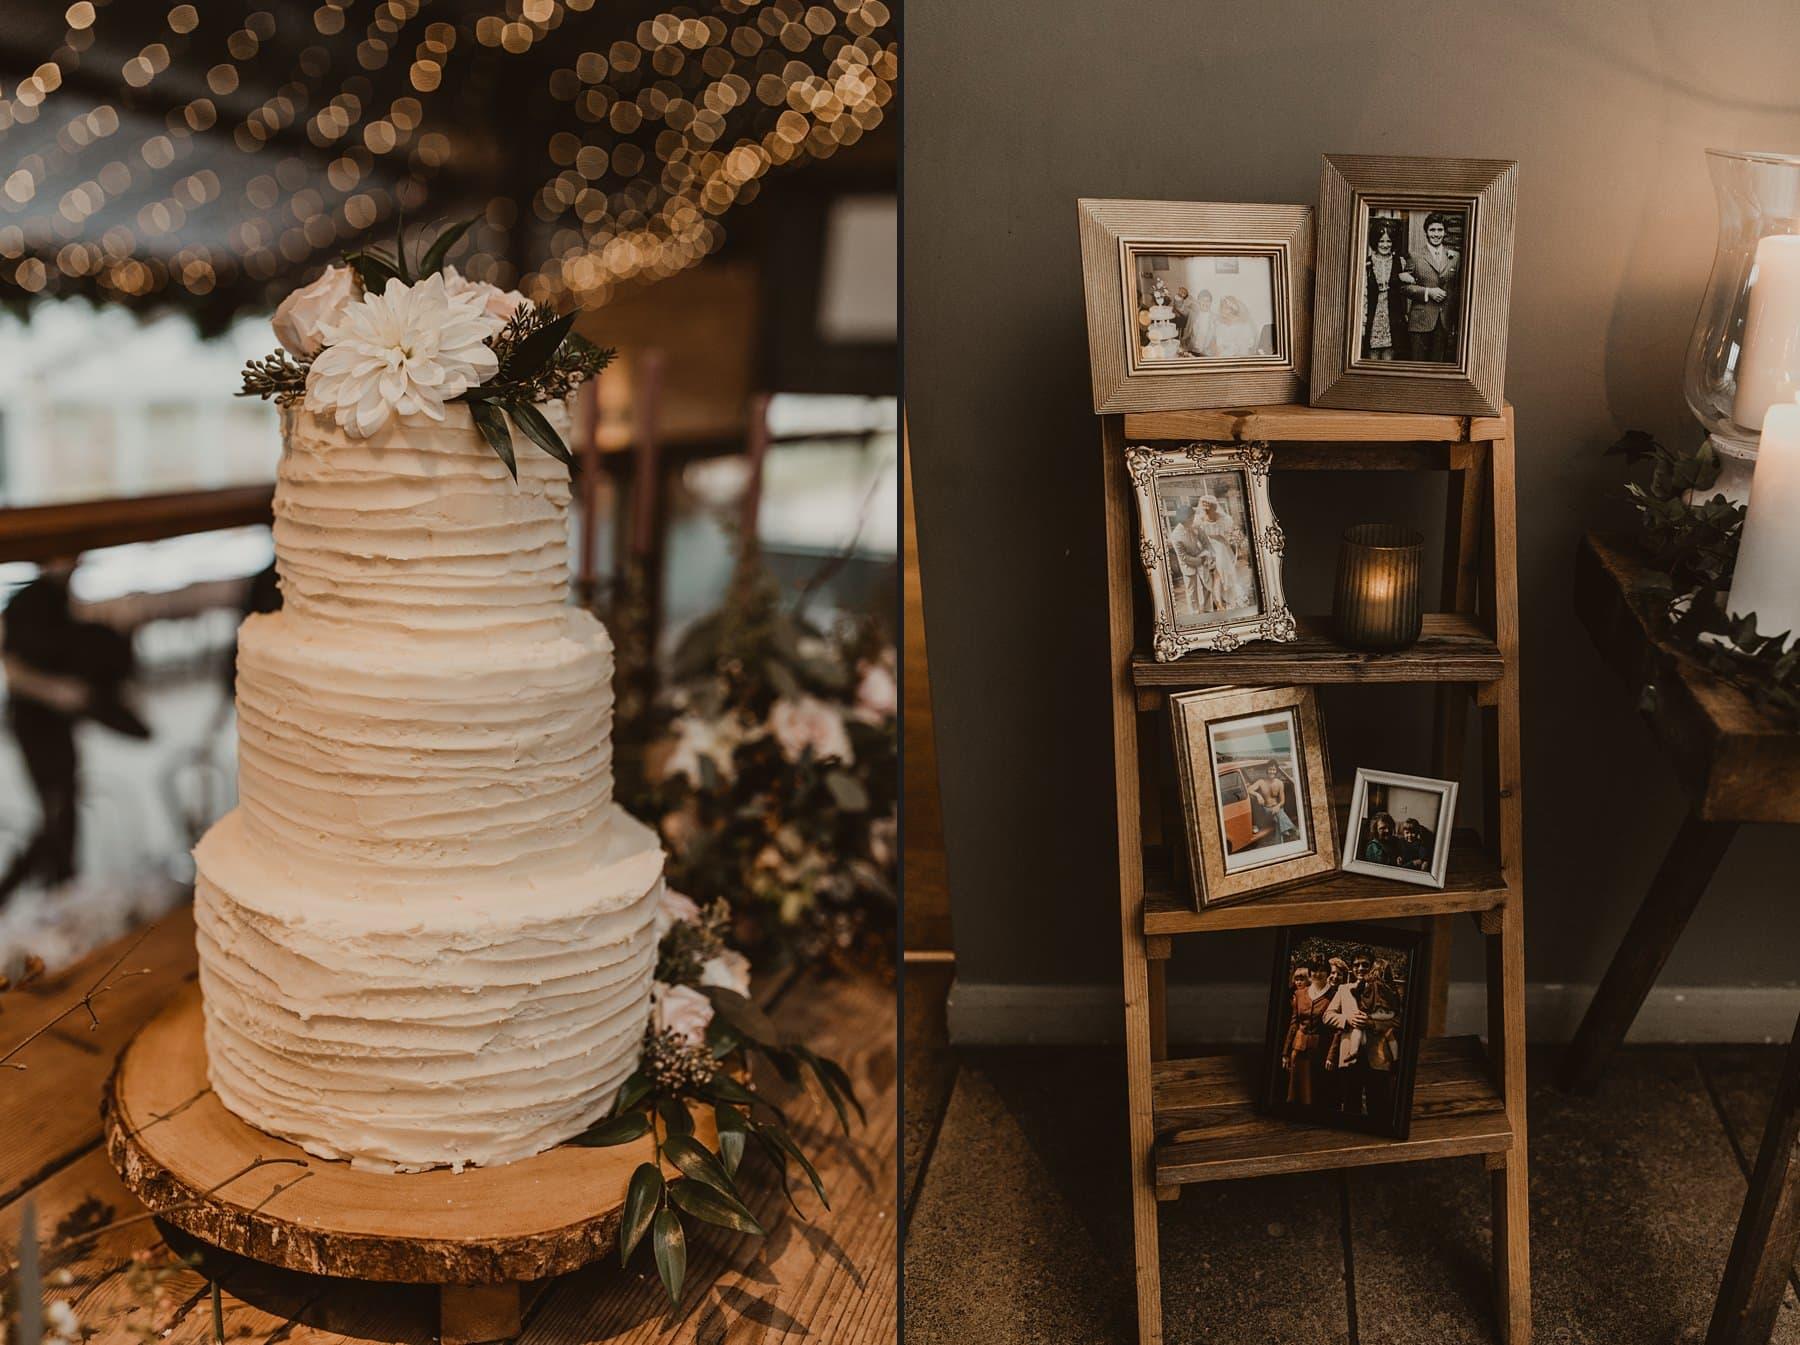 wedding cake and memory ladder